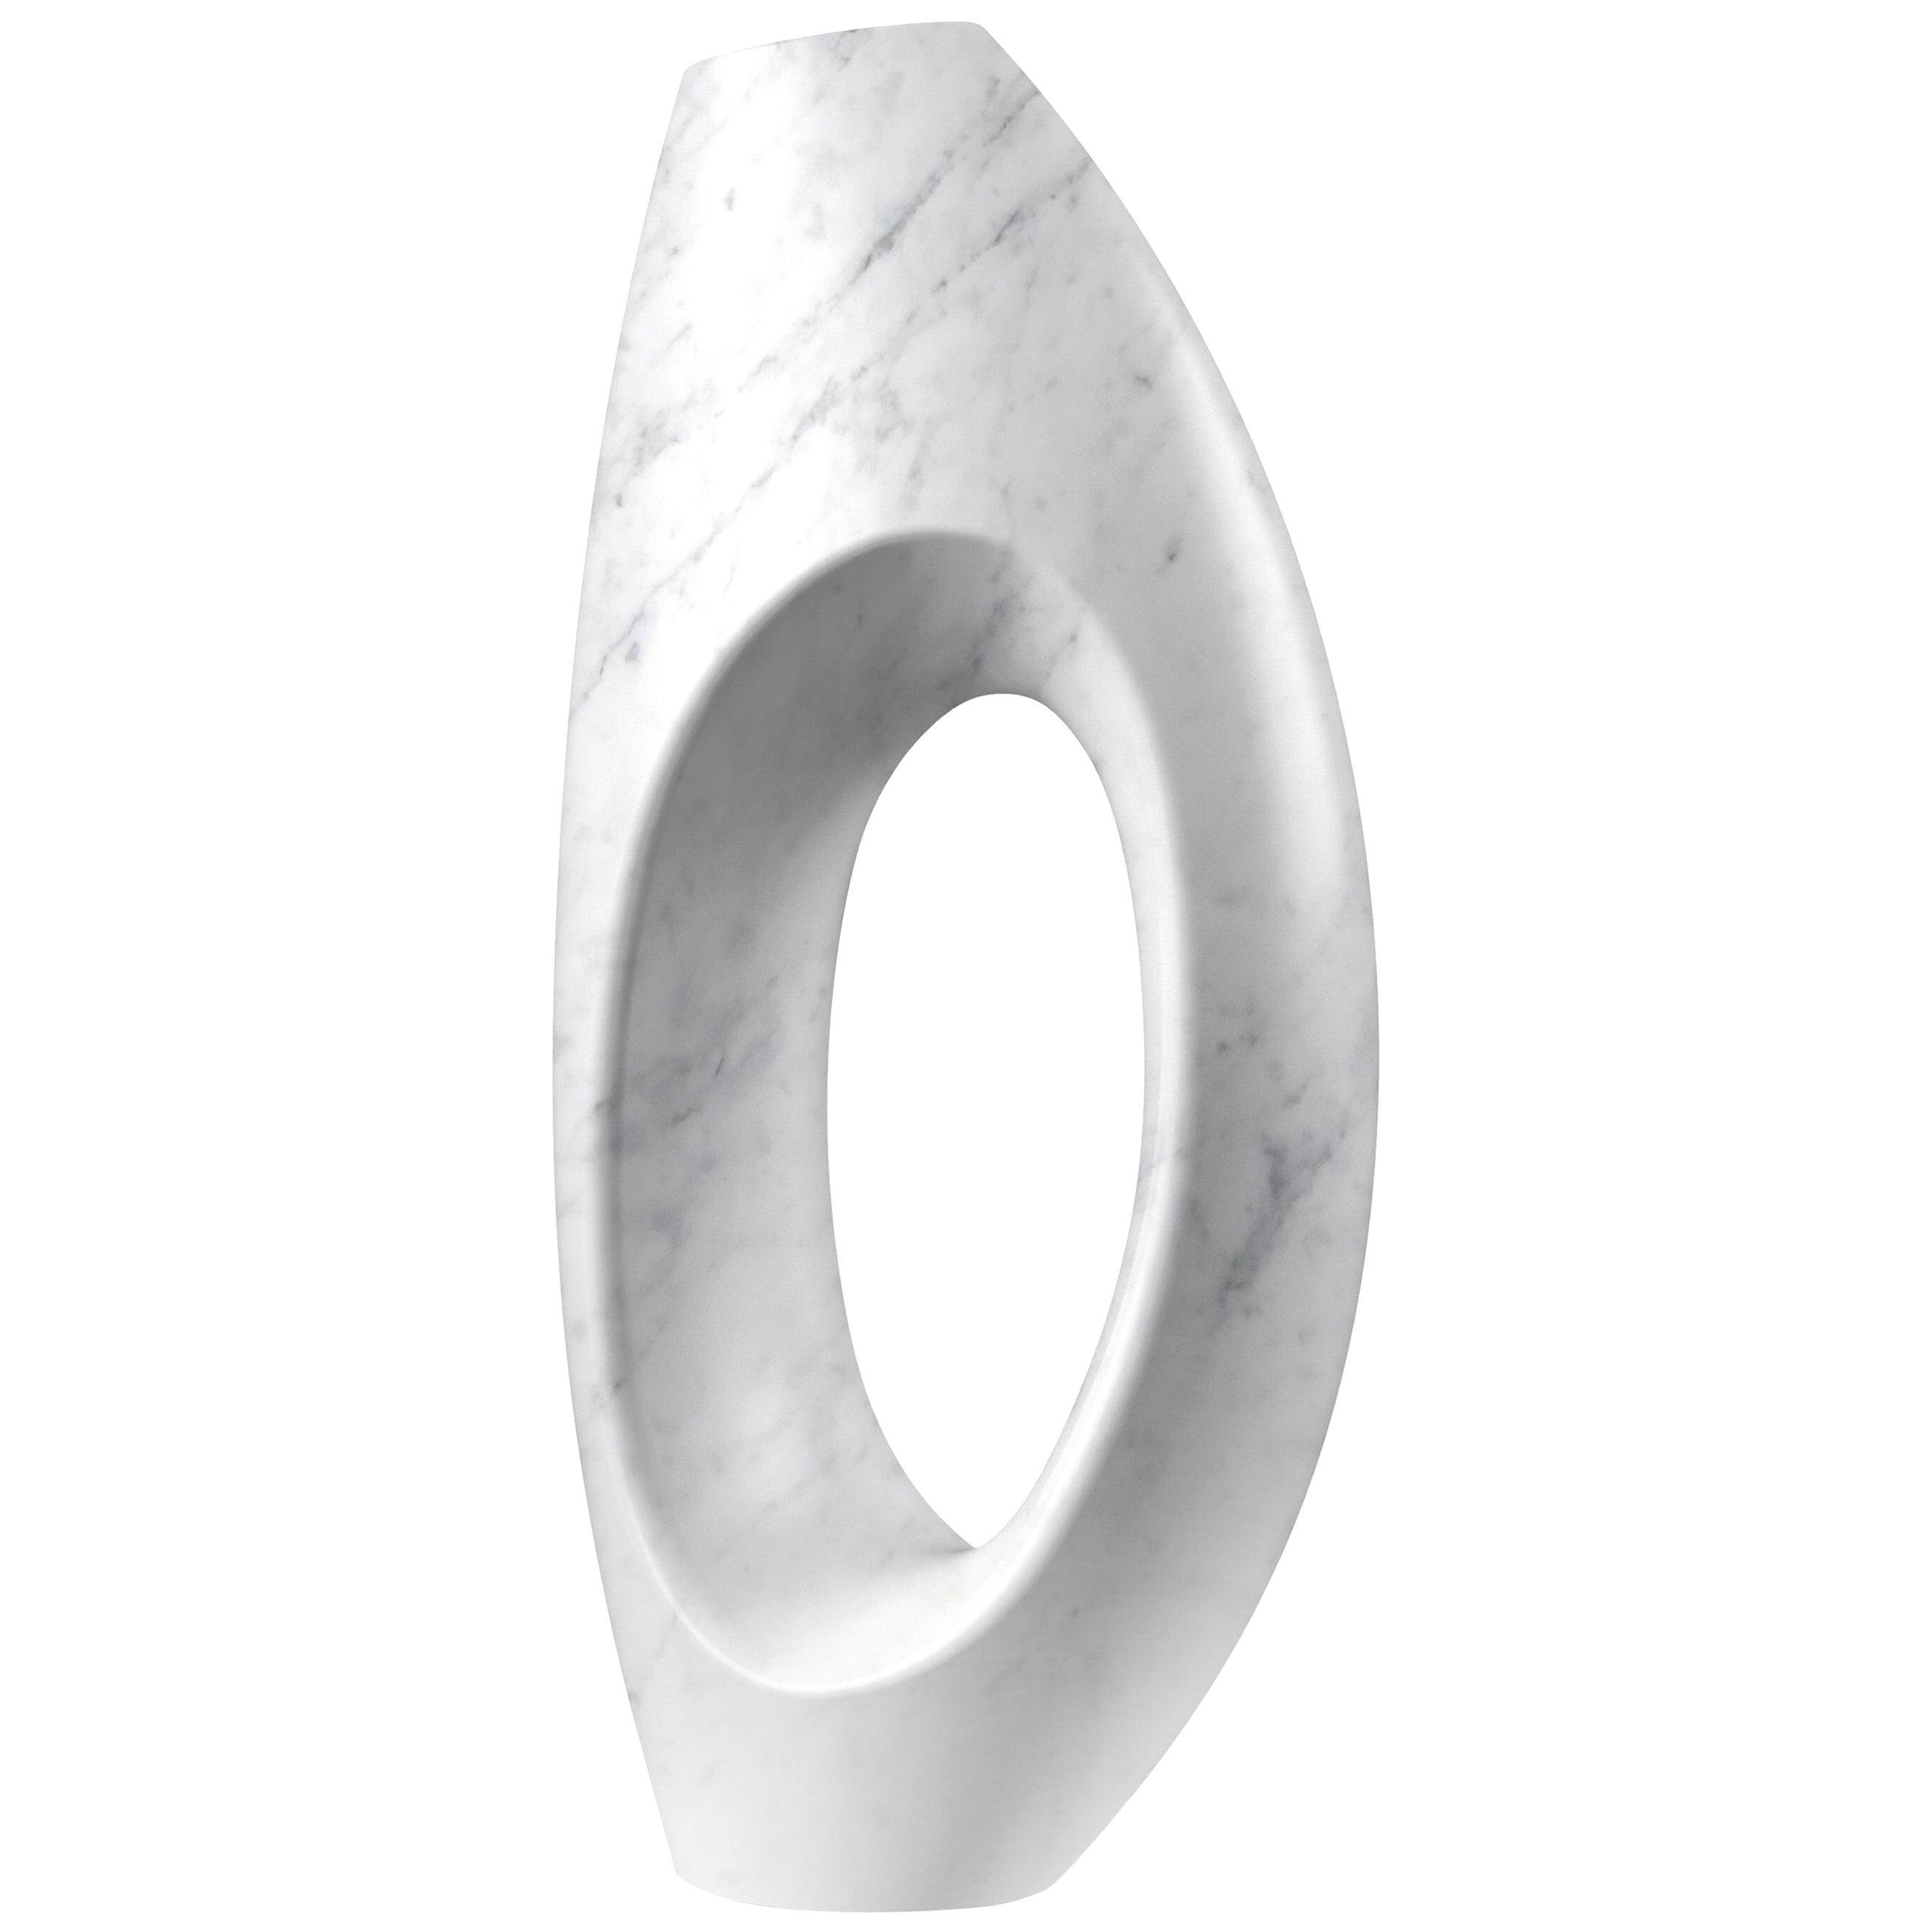 Sculpture Vase Marble White Carrara Italian Contemporary Design